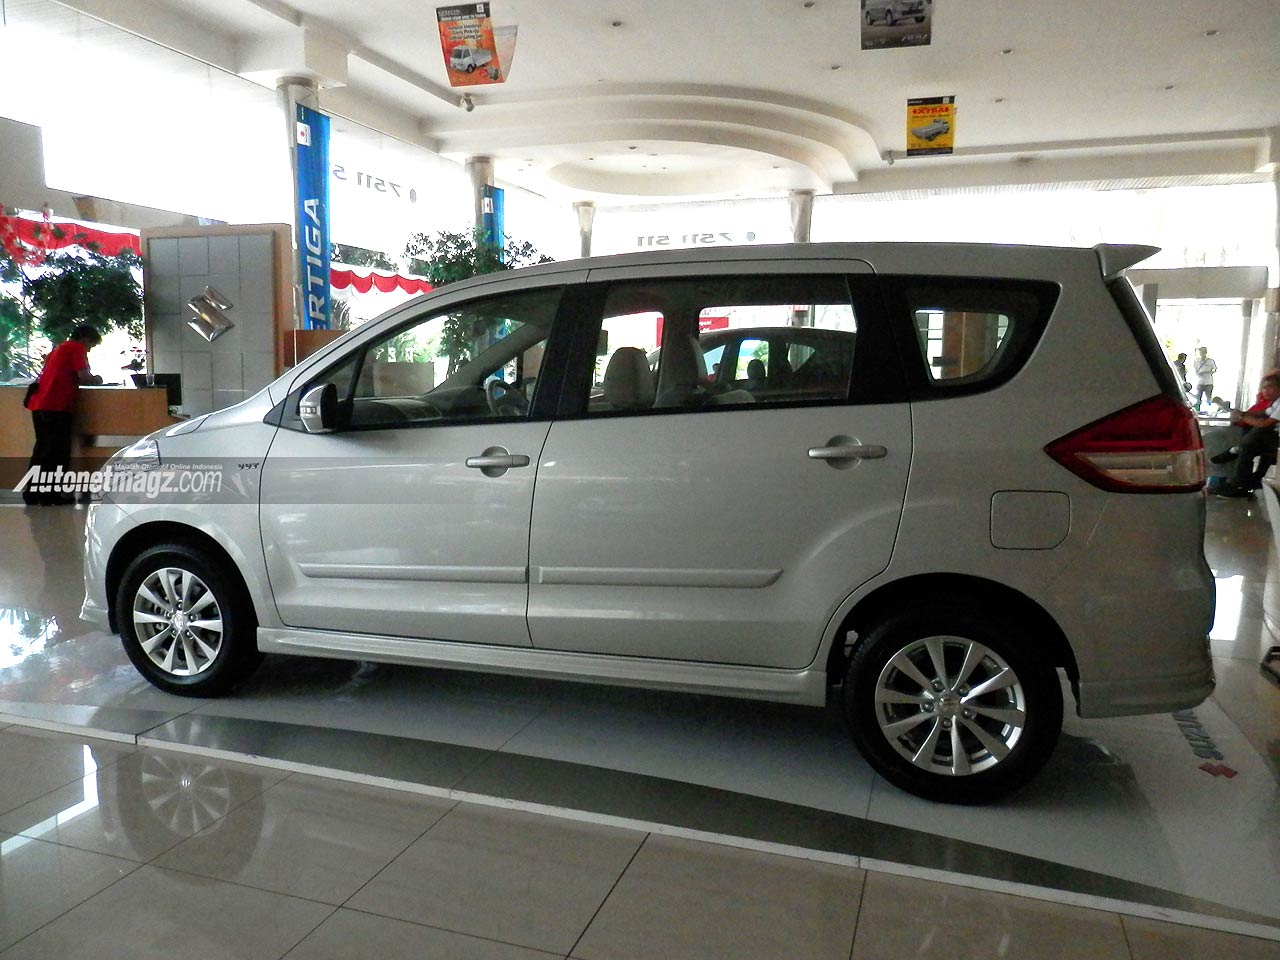 IIMS 2013, Suzuki Ertiga Elegant 2013: Suzuki Ertiga Elegant Tampil Lebih Mewah [with Video]